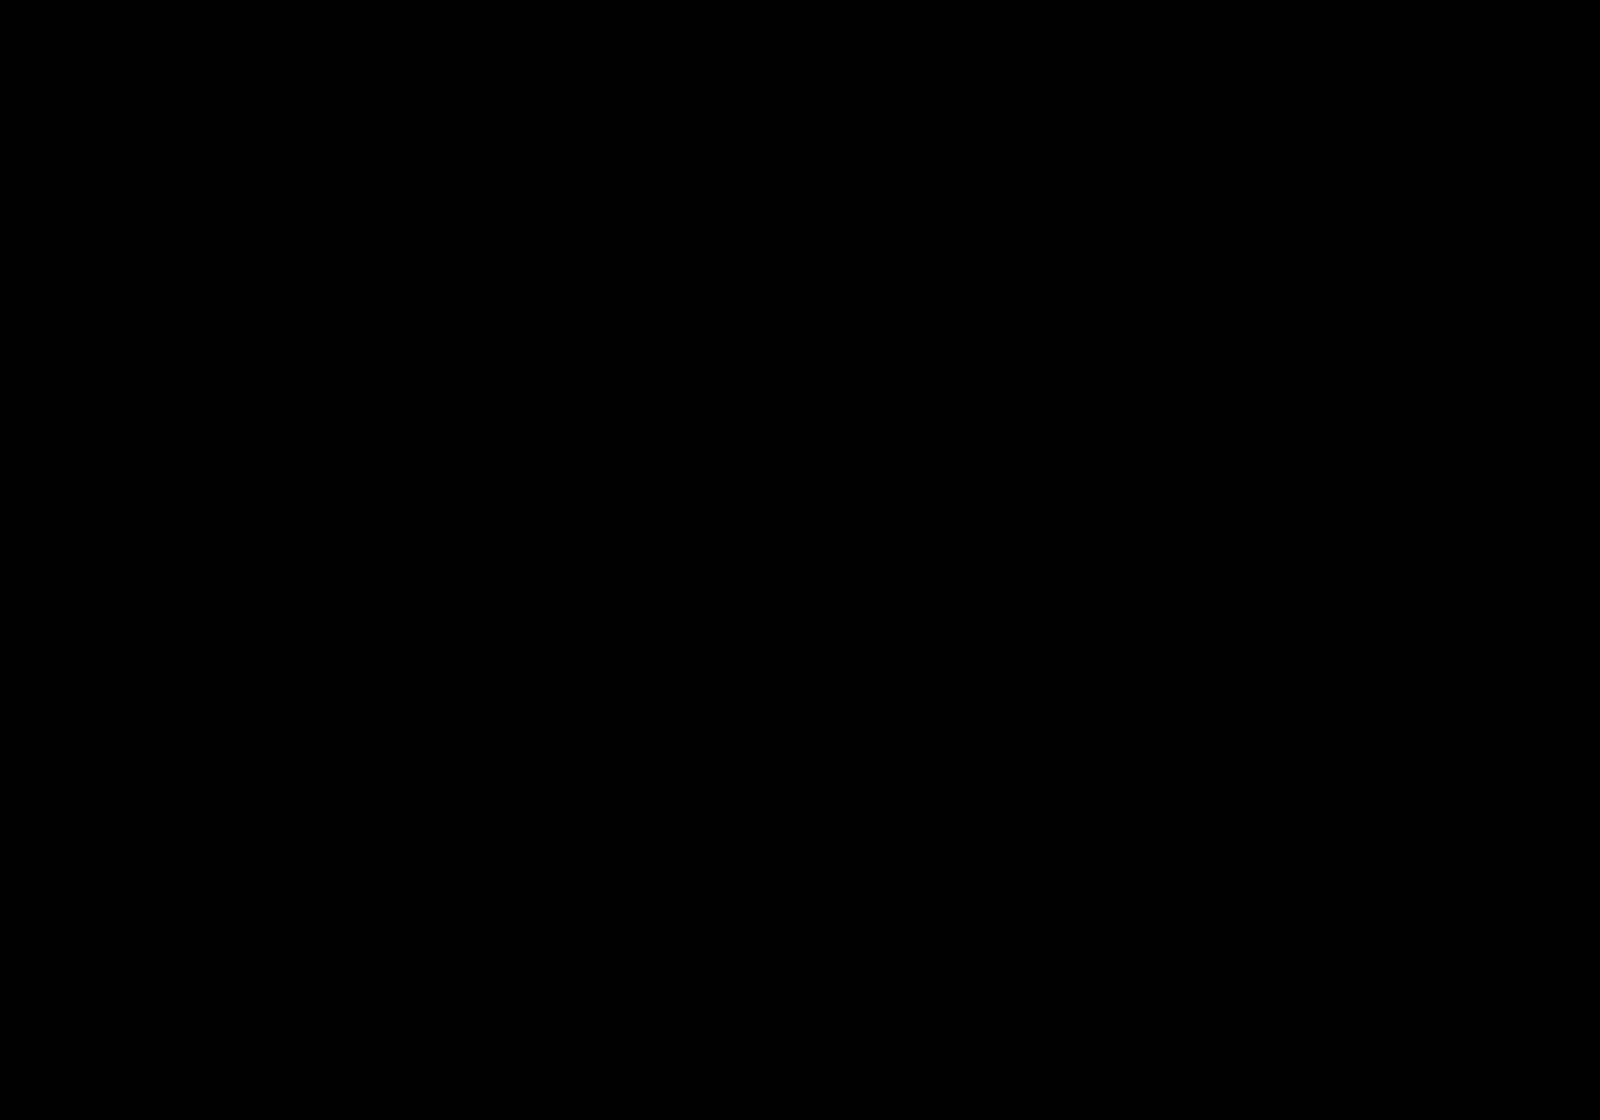 p rq 1990 mustang 5 0 by musaudi on deviantart